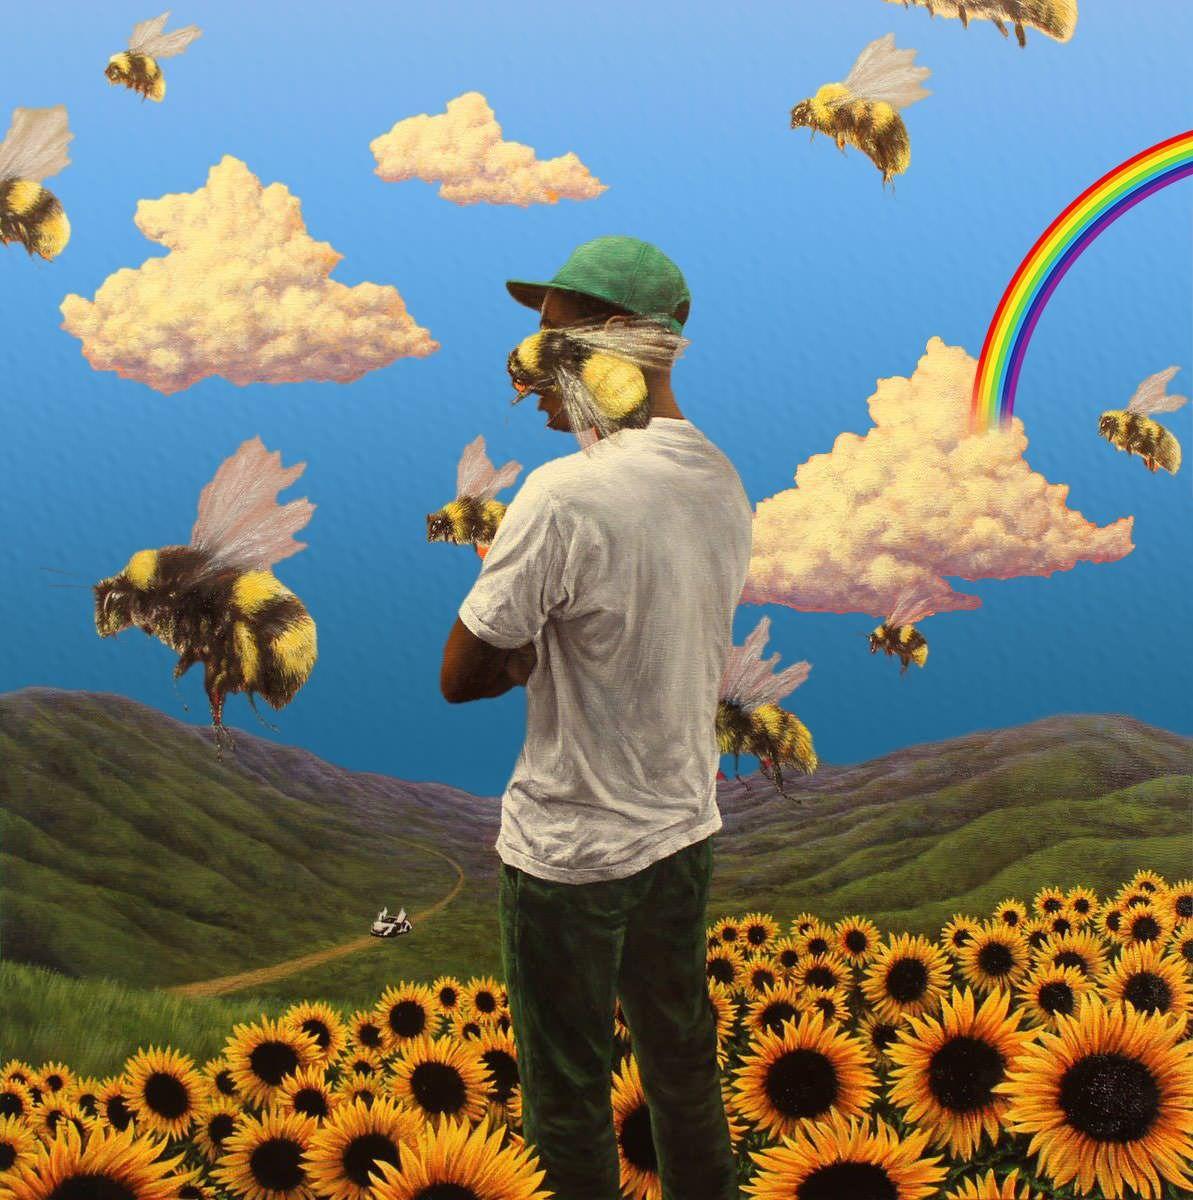 blue > yellow flower boy in 2020 Flower boy (album